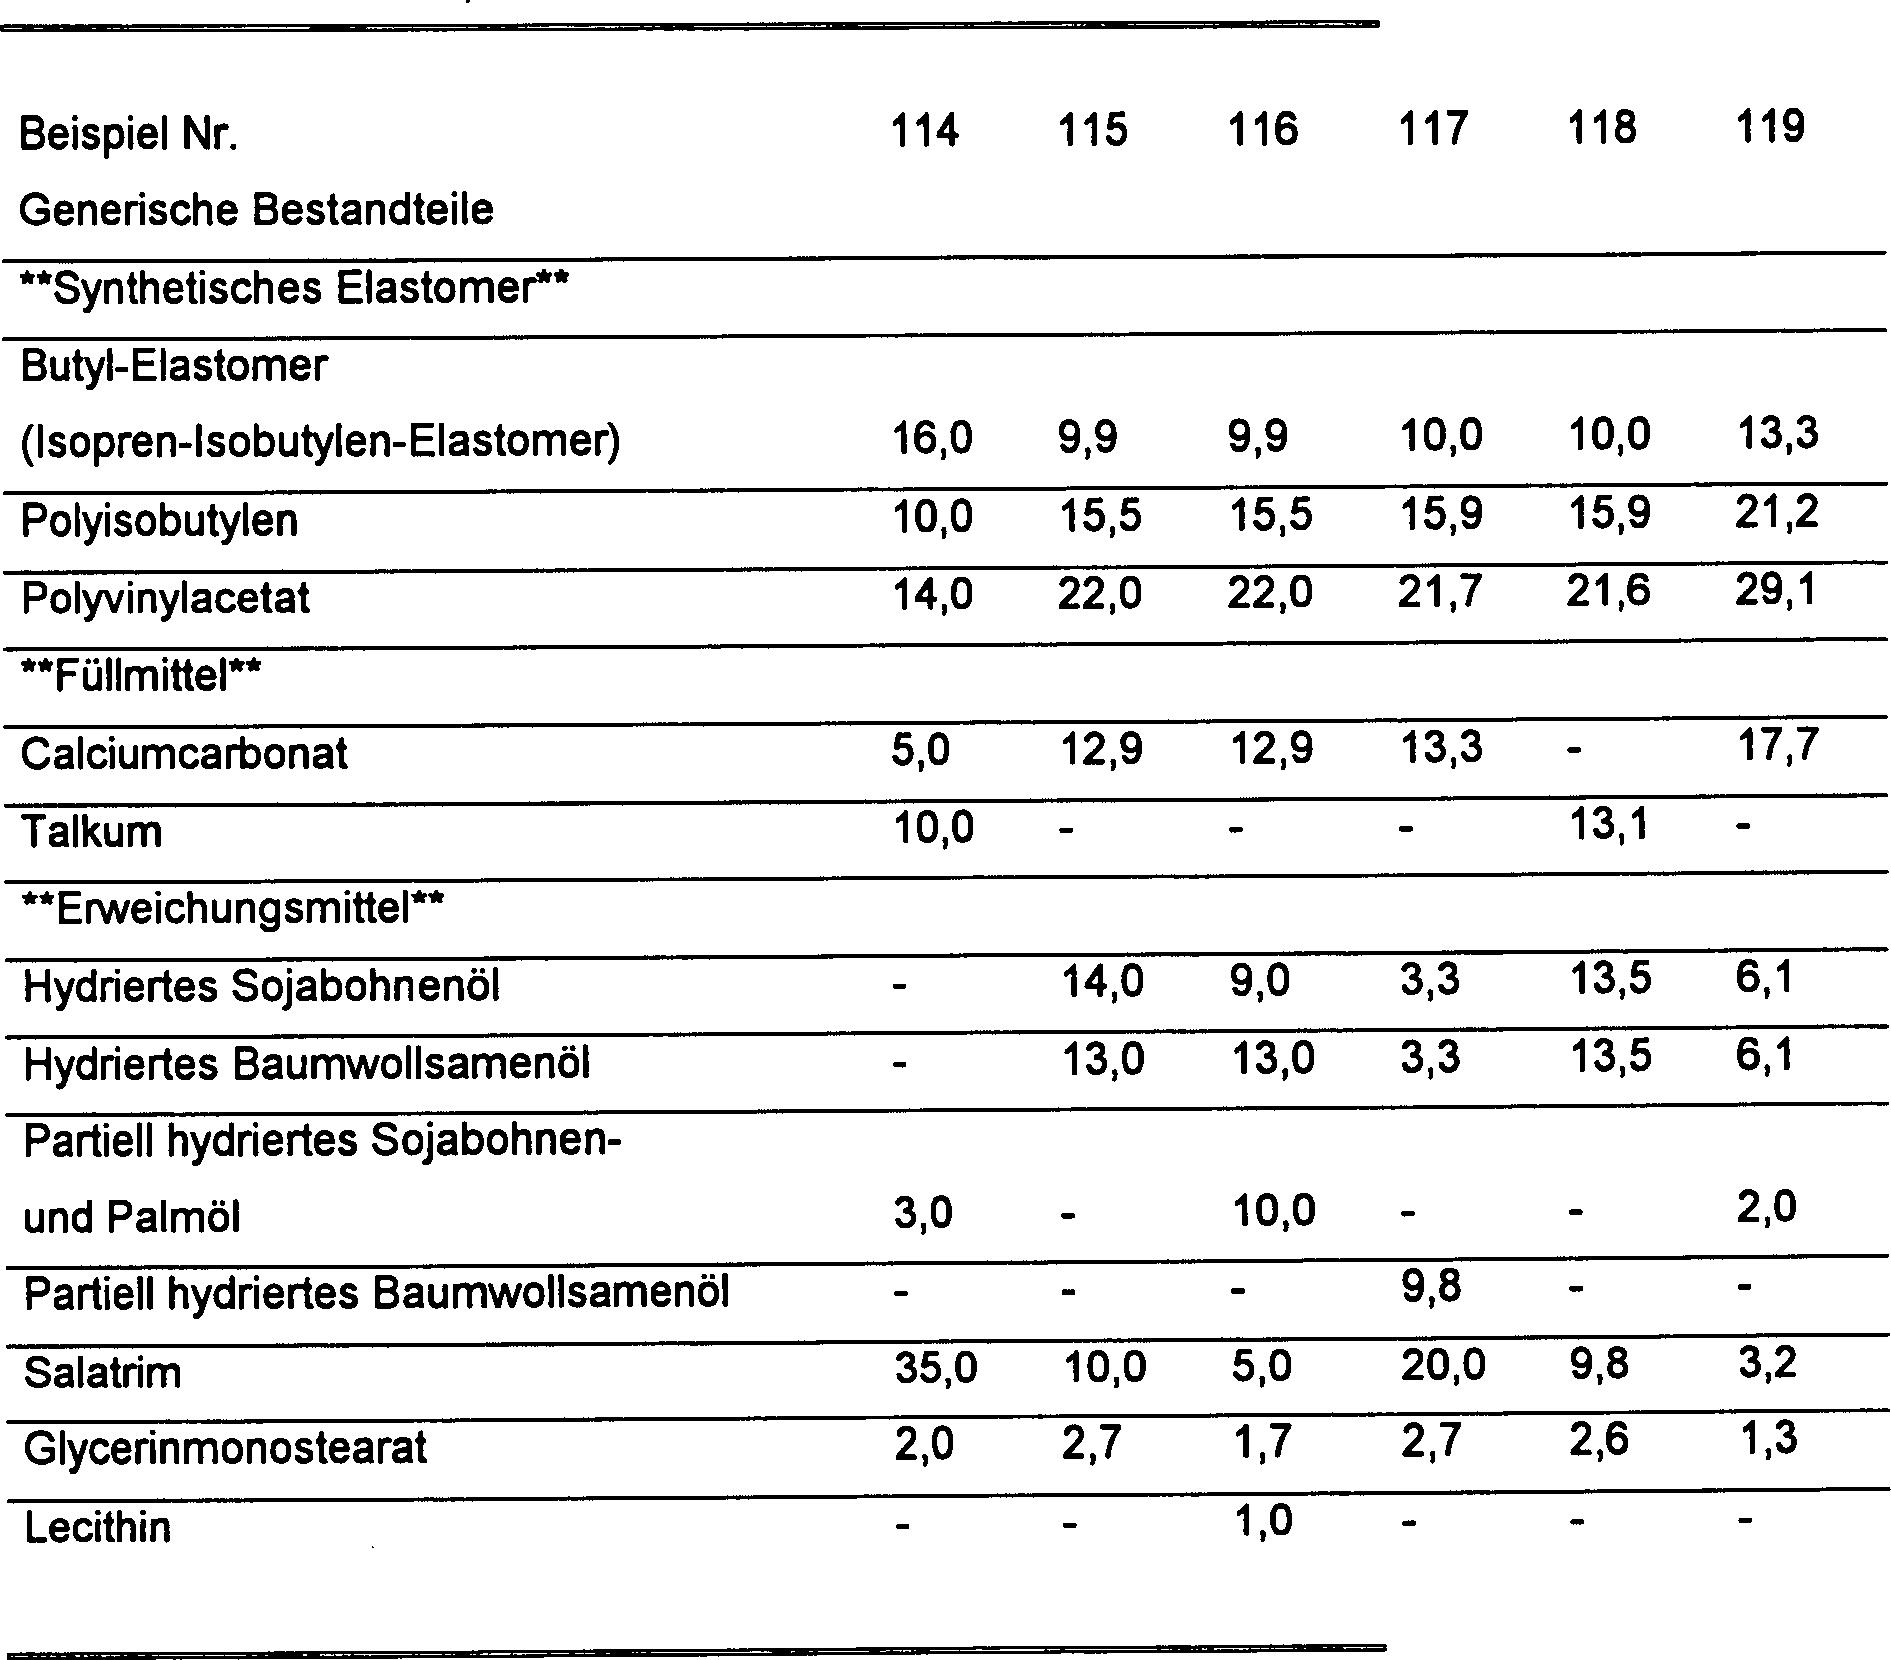 19 Luxury Blood Glucose 114